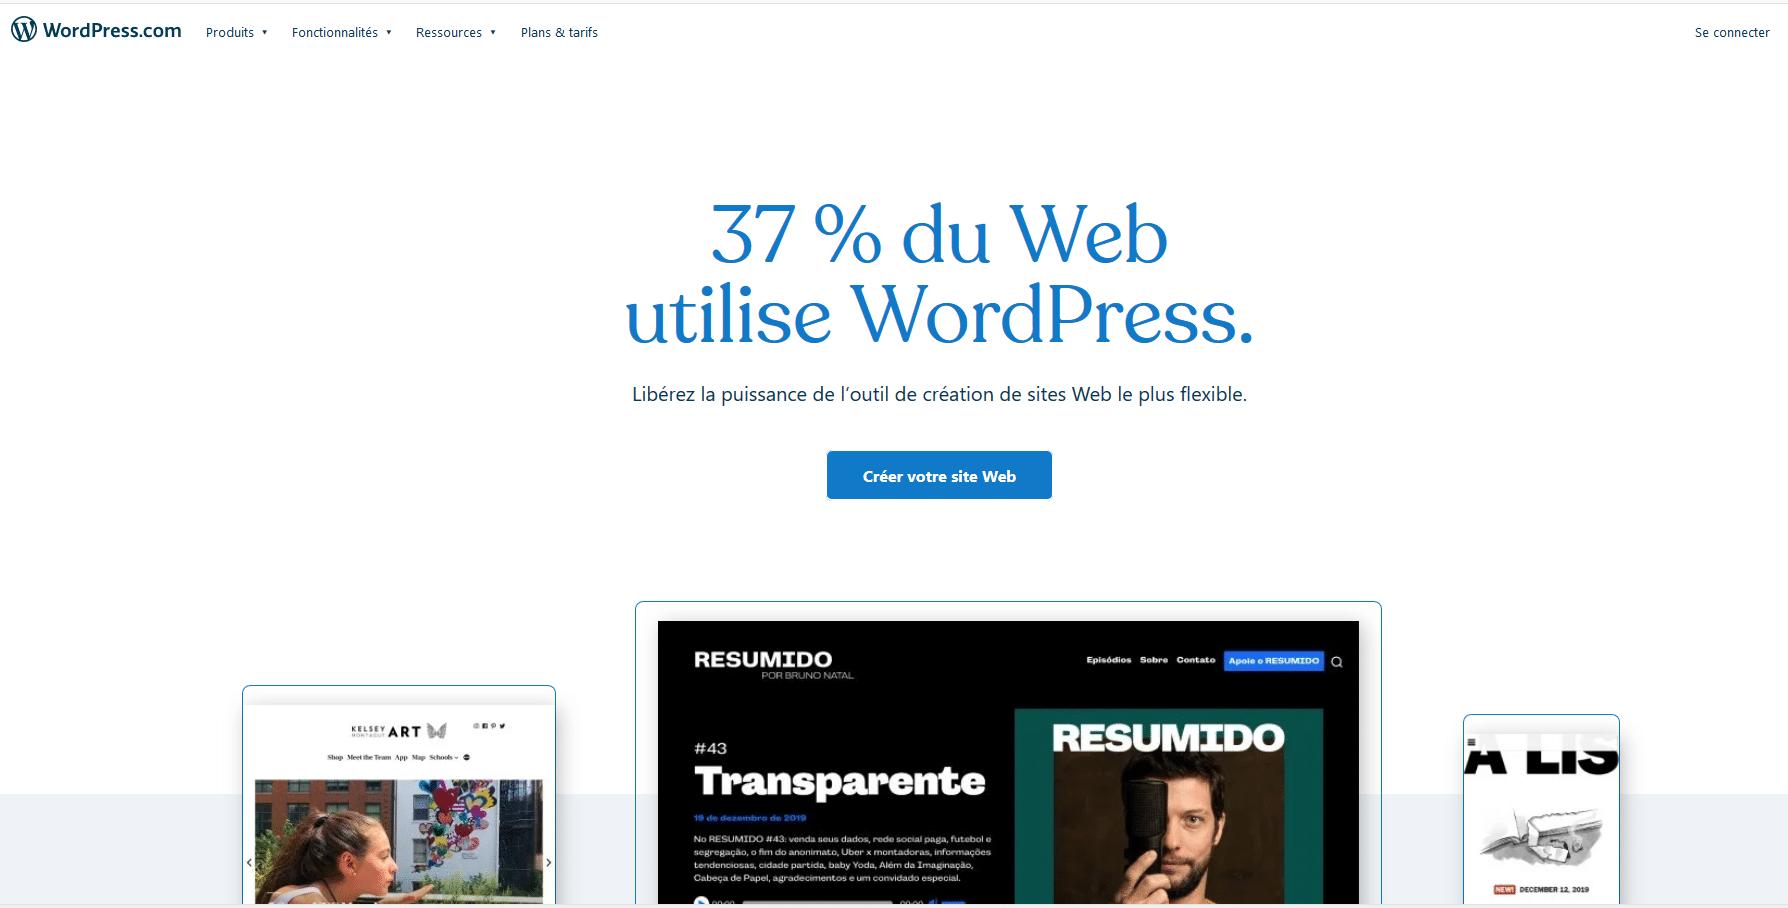 interface wordpress.com